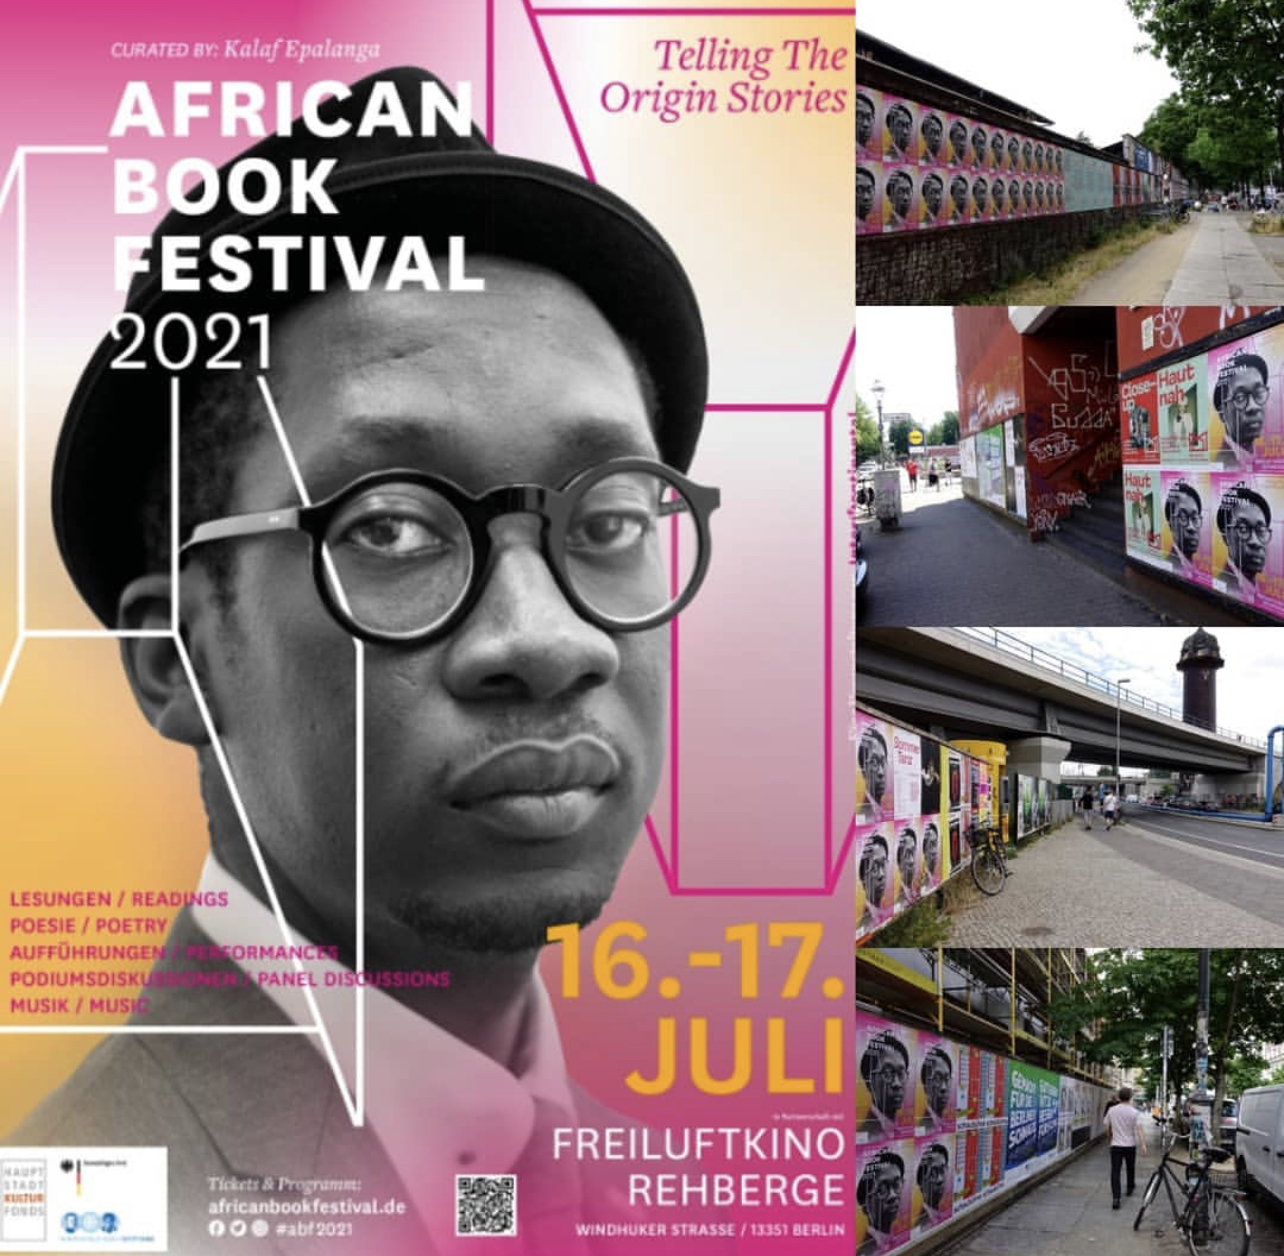 African books fest